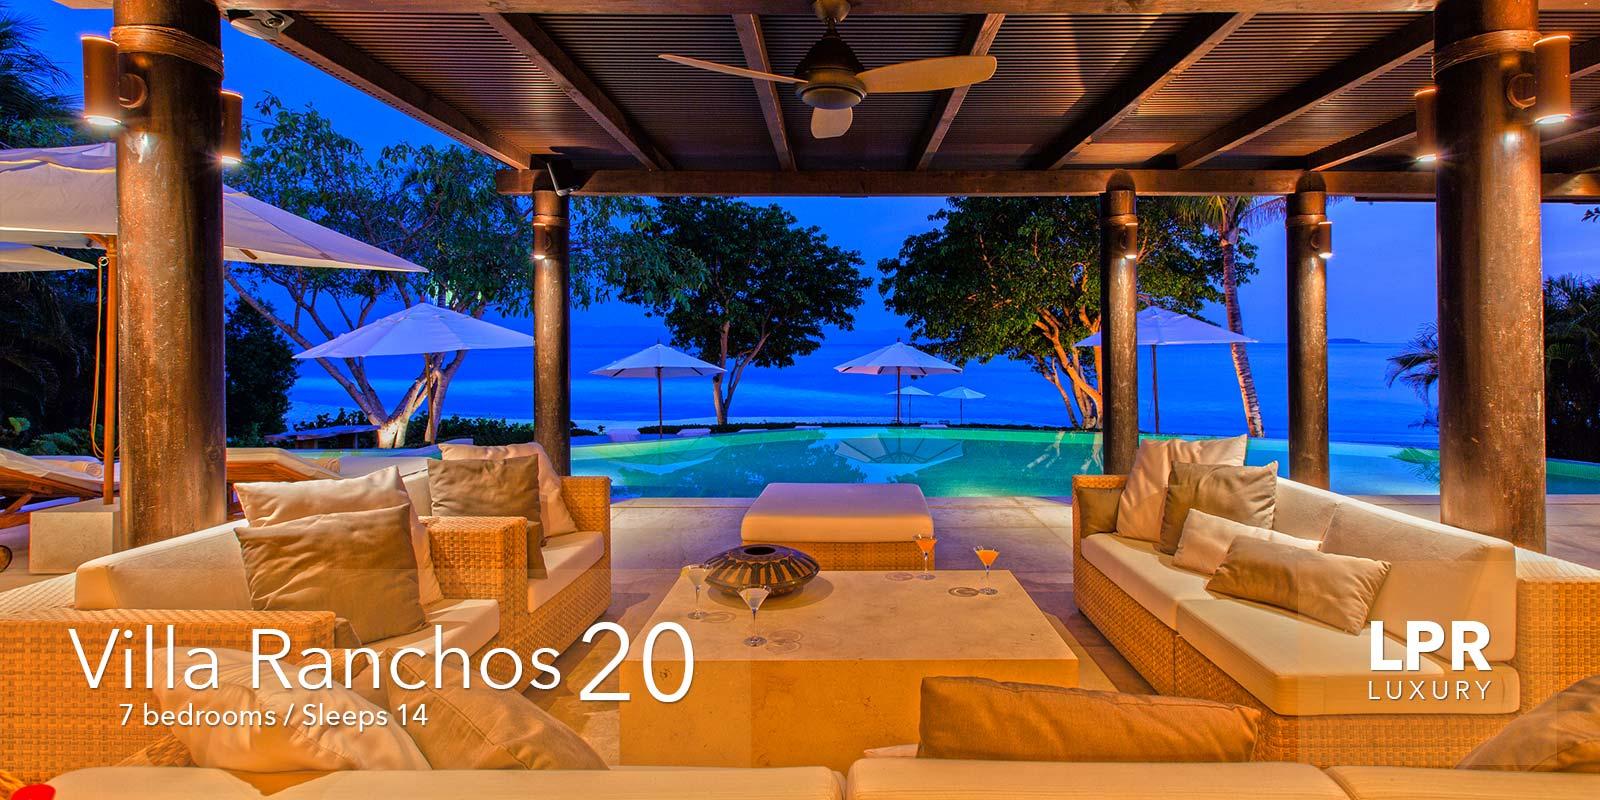 Villa Ranchos 20 - Punta Mita Resort luxury vacation villa in Riviera Nayarit, Mexico